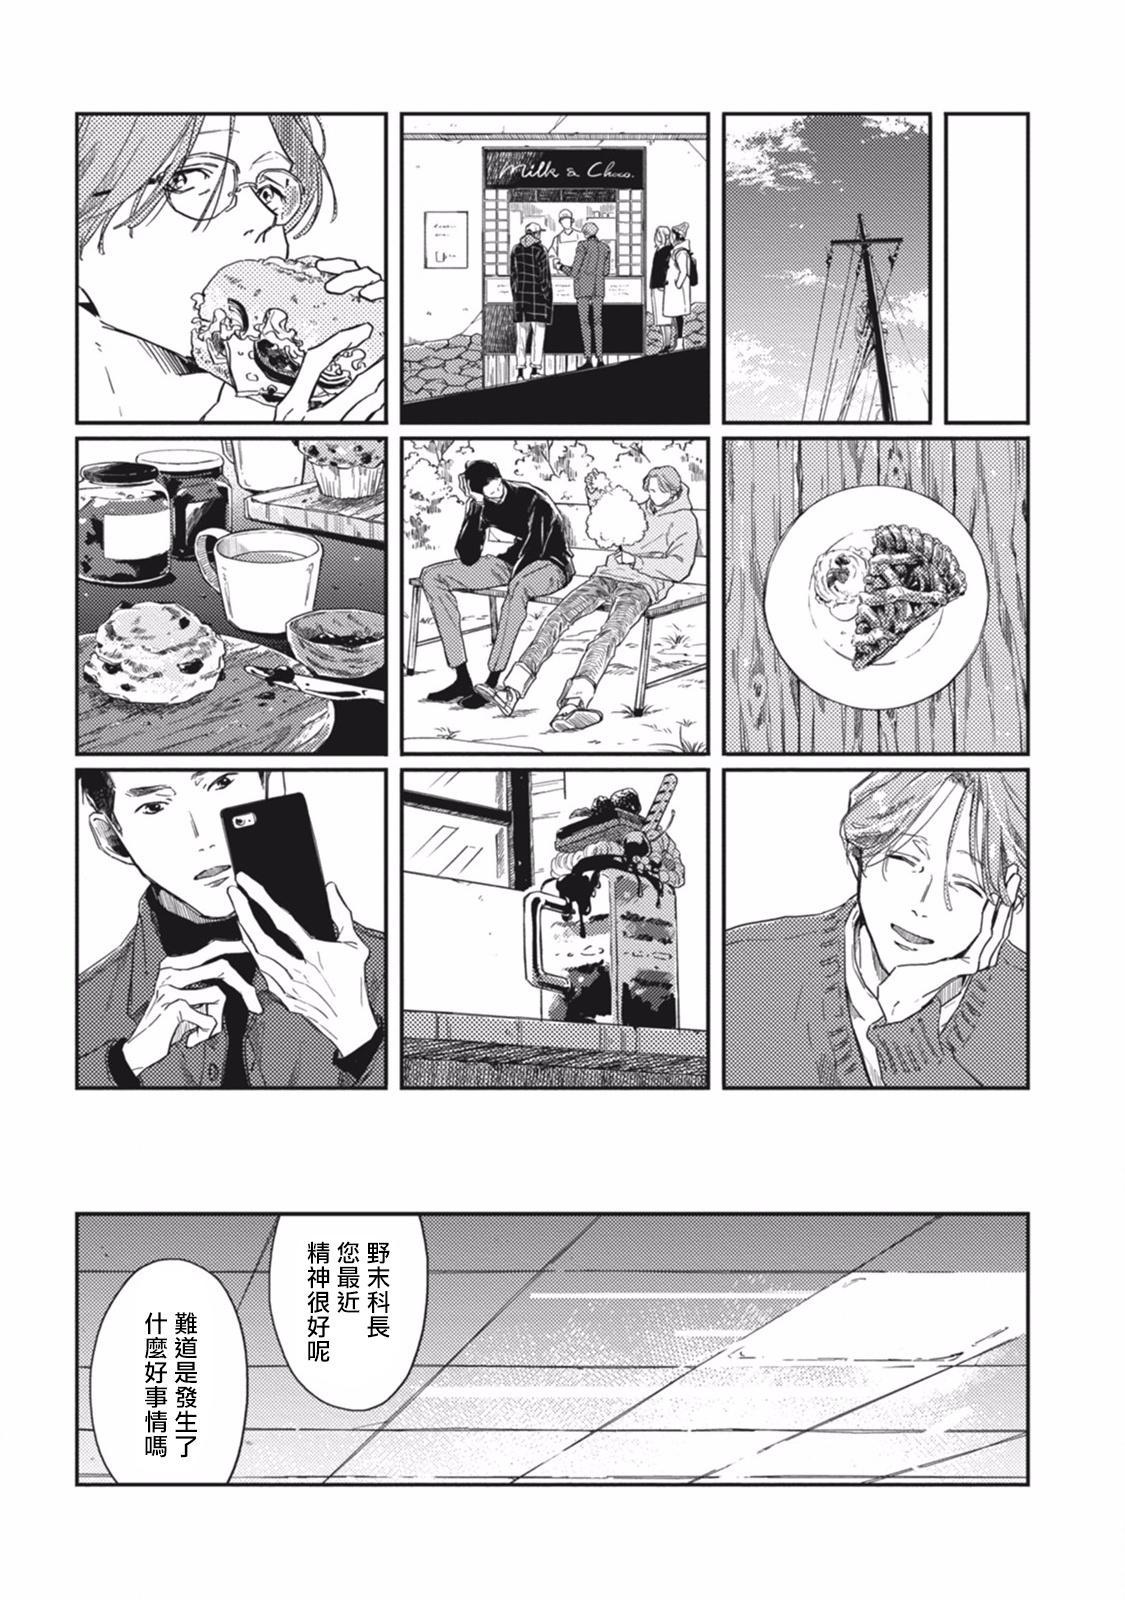 [Sagan Sagan] Old-fashioned Cupcake Ch. 1-2 [Chinese] [拾荒者汉化组] [Digital] 65